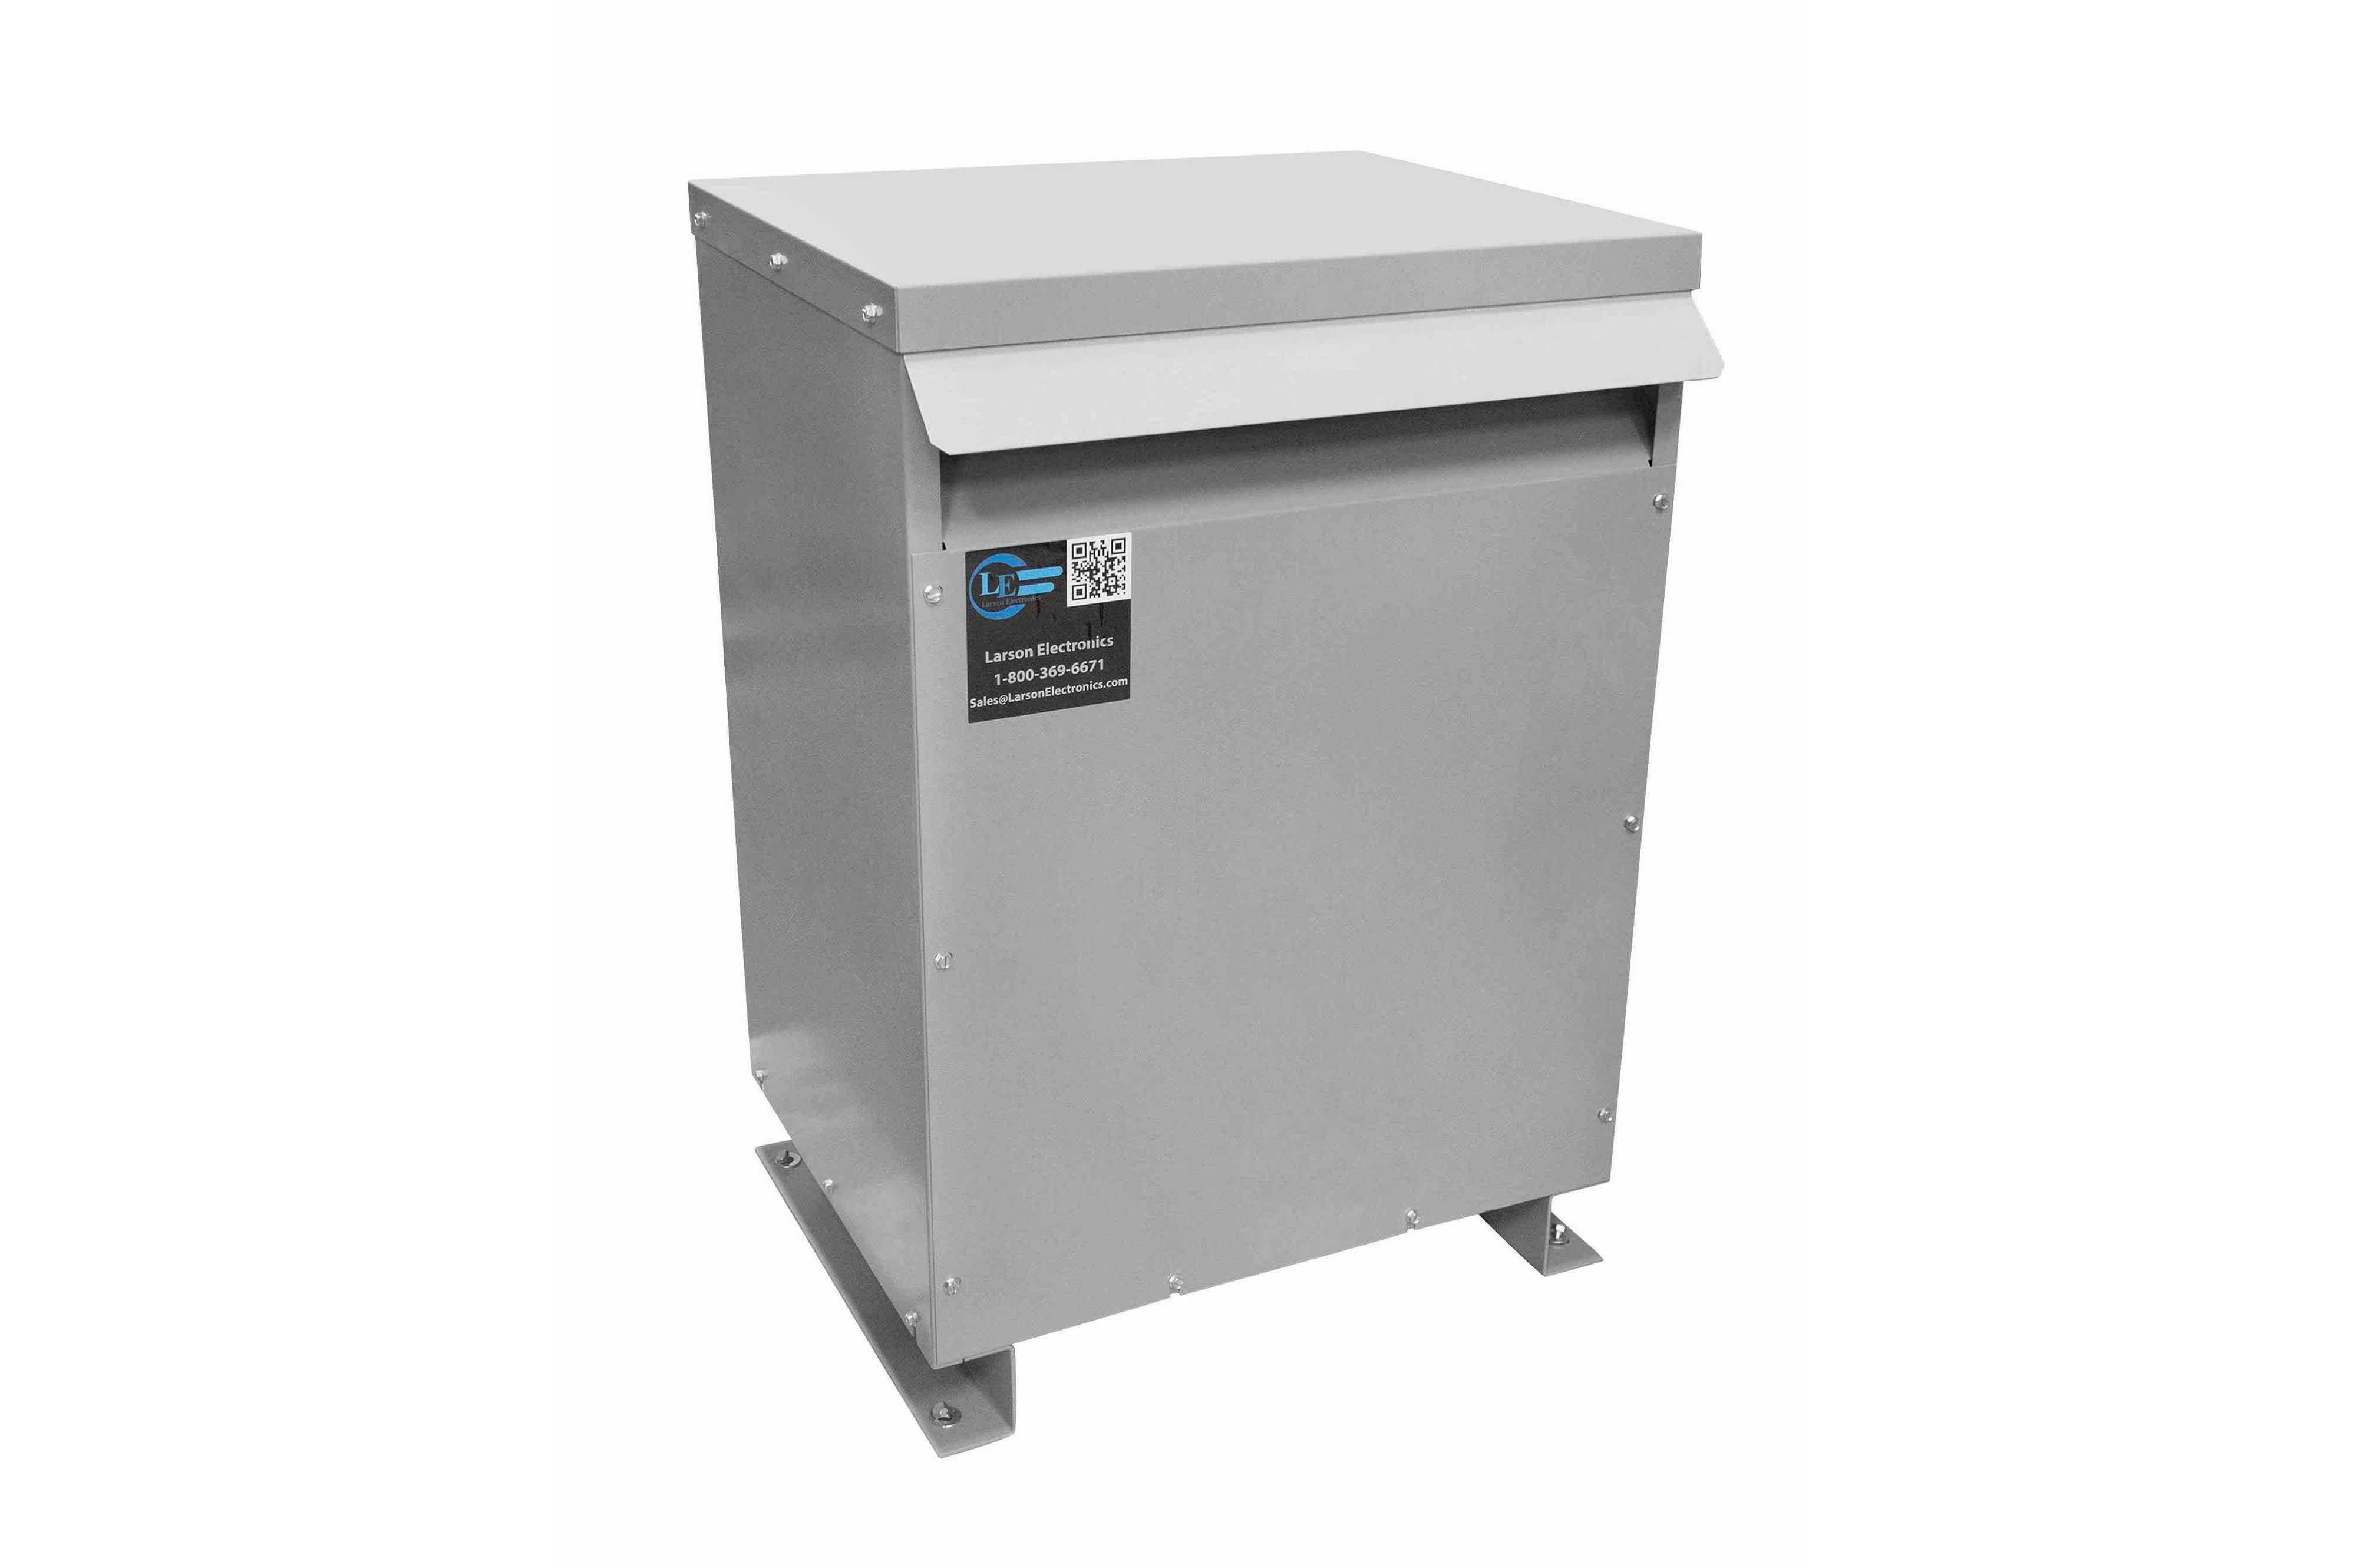 37.5 kVA 3PH DOE Transformer, 480V Delta Primary, 415Y/240 Wye-N Secondary, N3R, Ventilated, 60 Hz